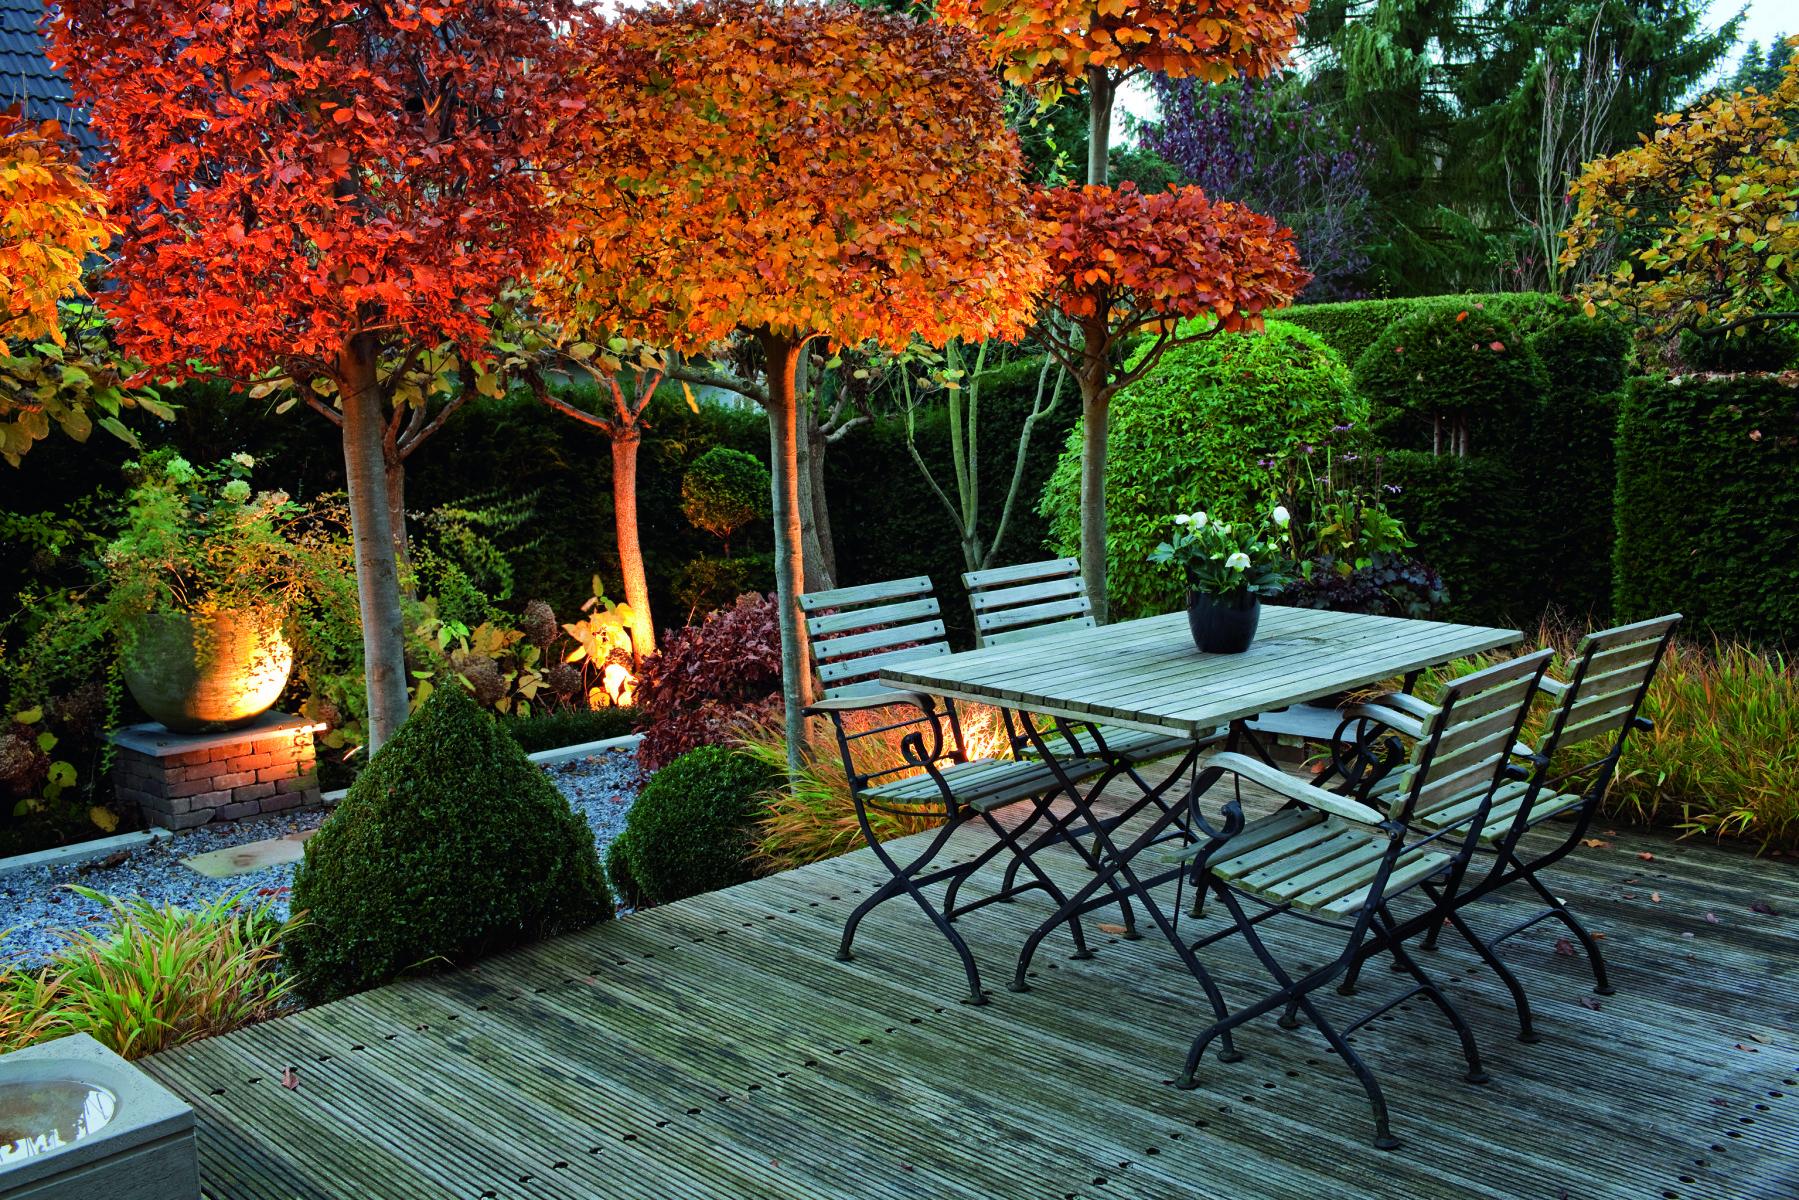 gallery of garten terrasse ideen innenr ume undbel interessant fur den kreativ garten terrasse ideen innenr ume und bel